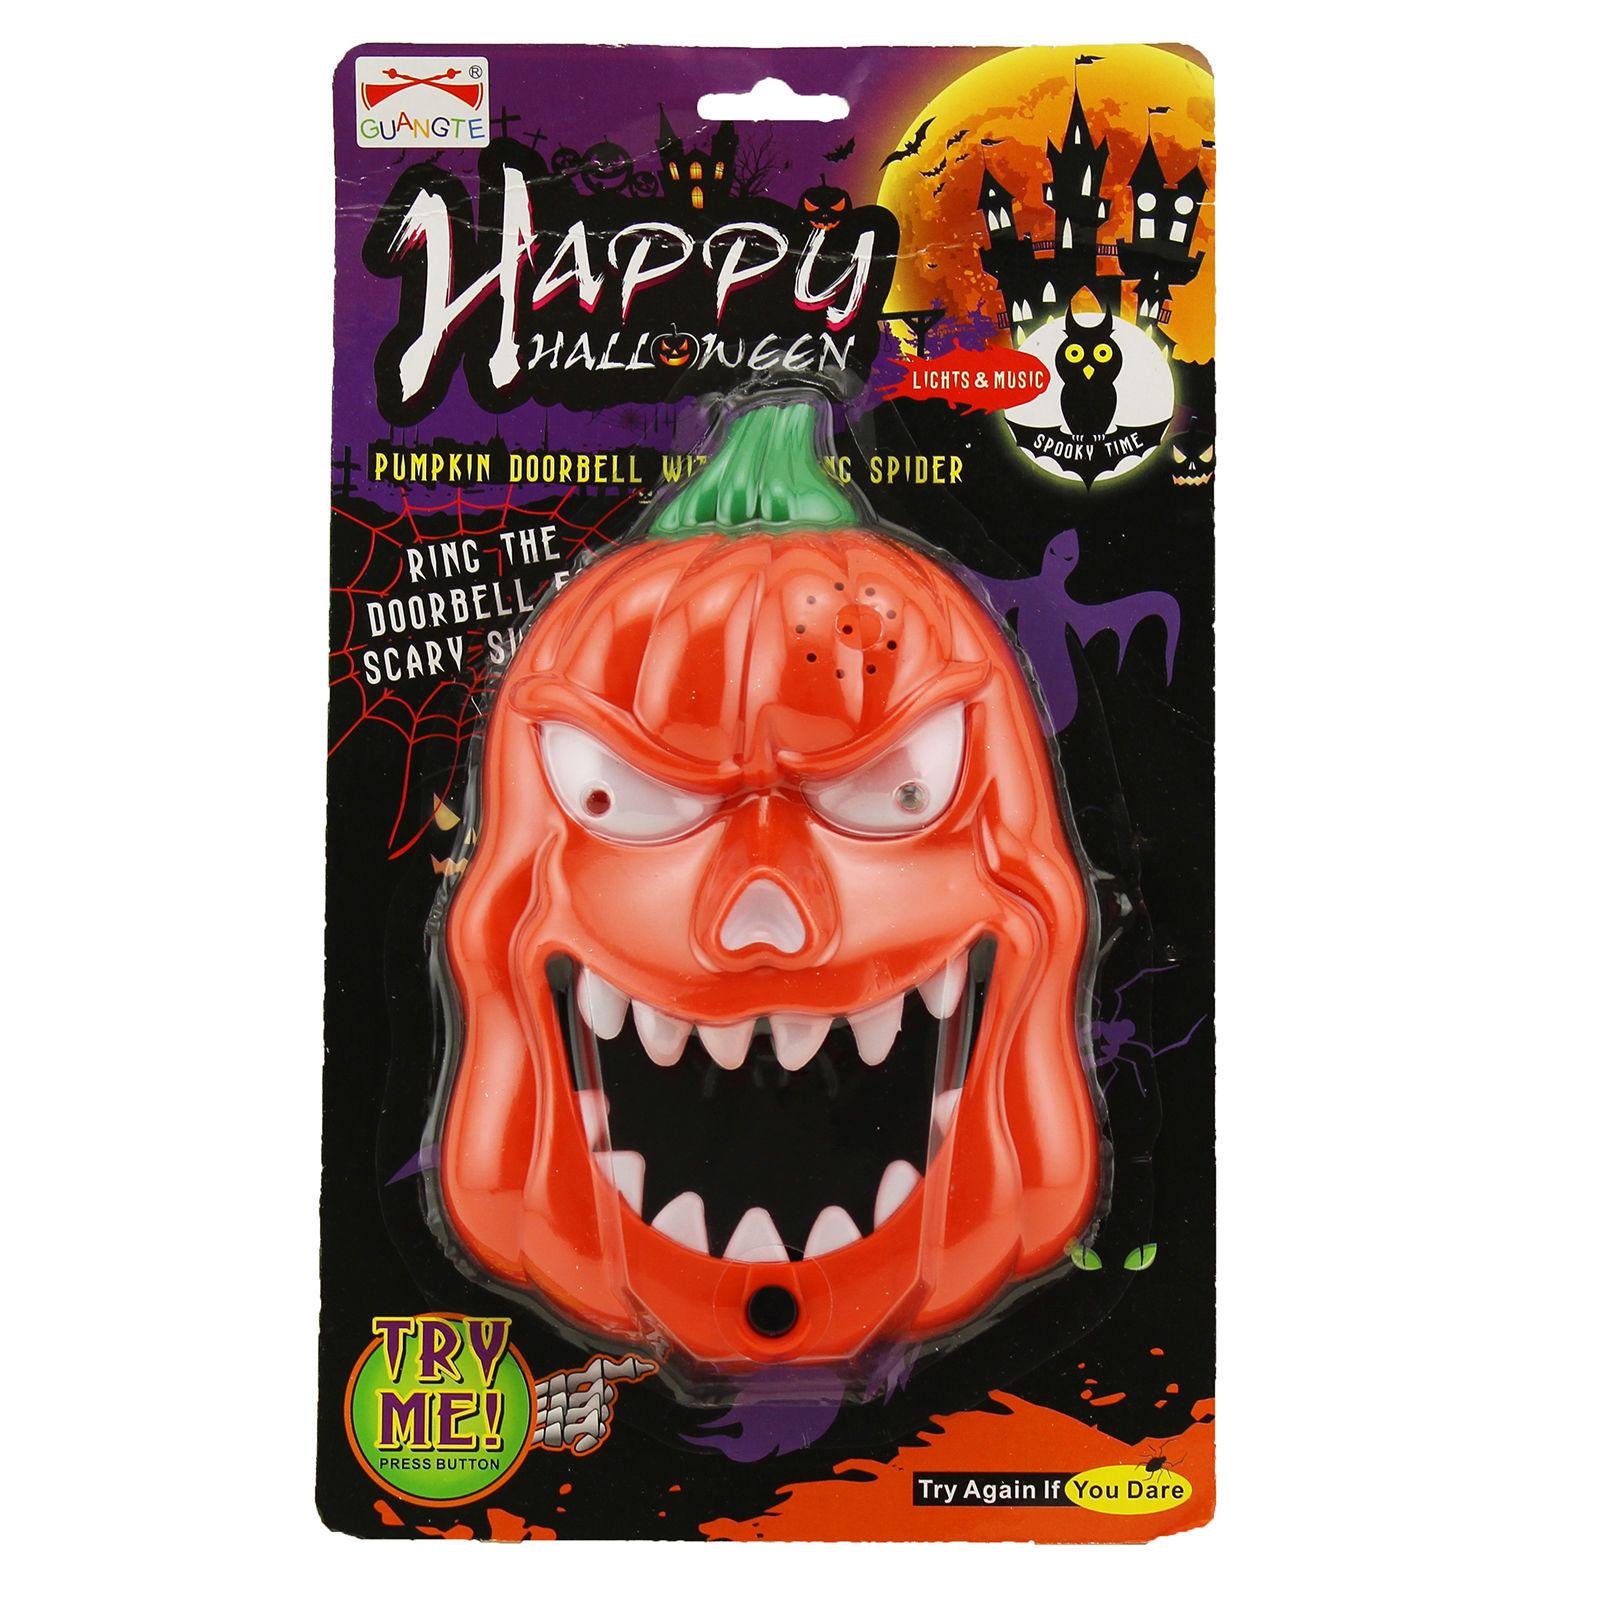 Halloween LED Flashing Sound Pumpkin Doorbell Talking Jack O Lantern Decoration